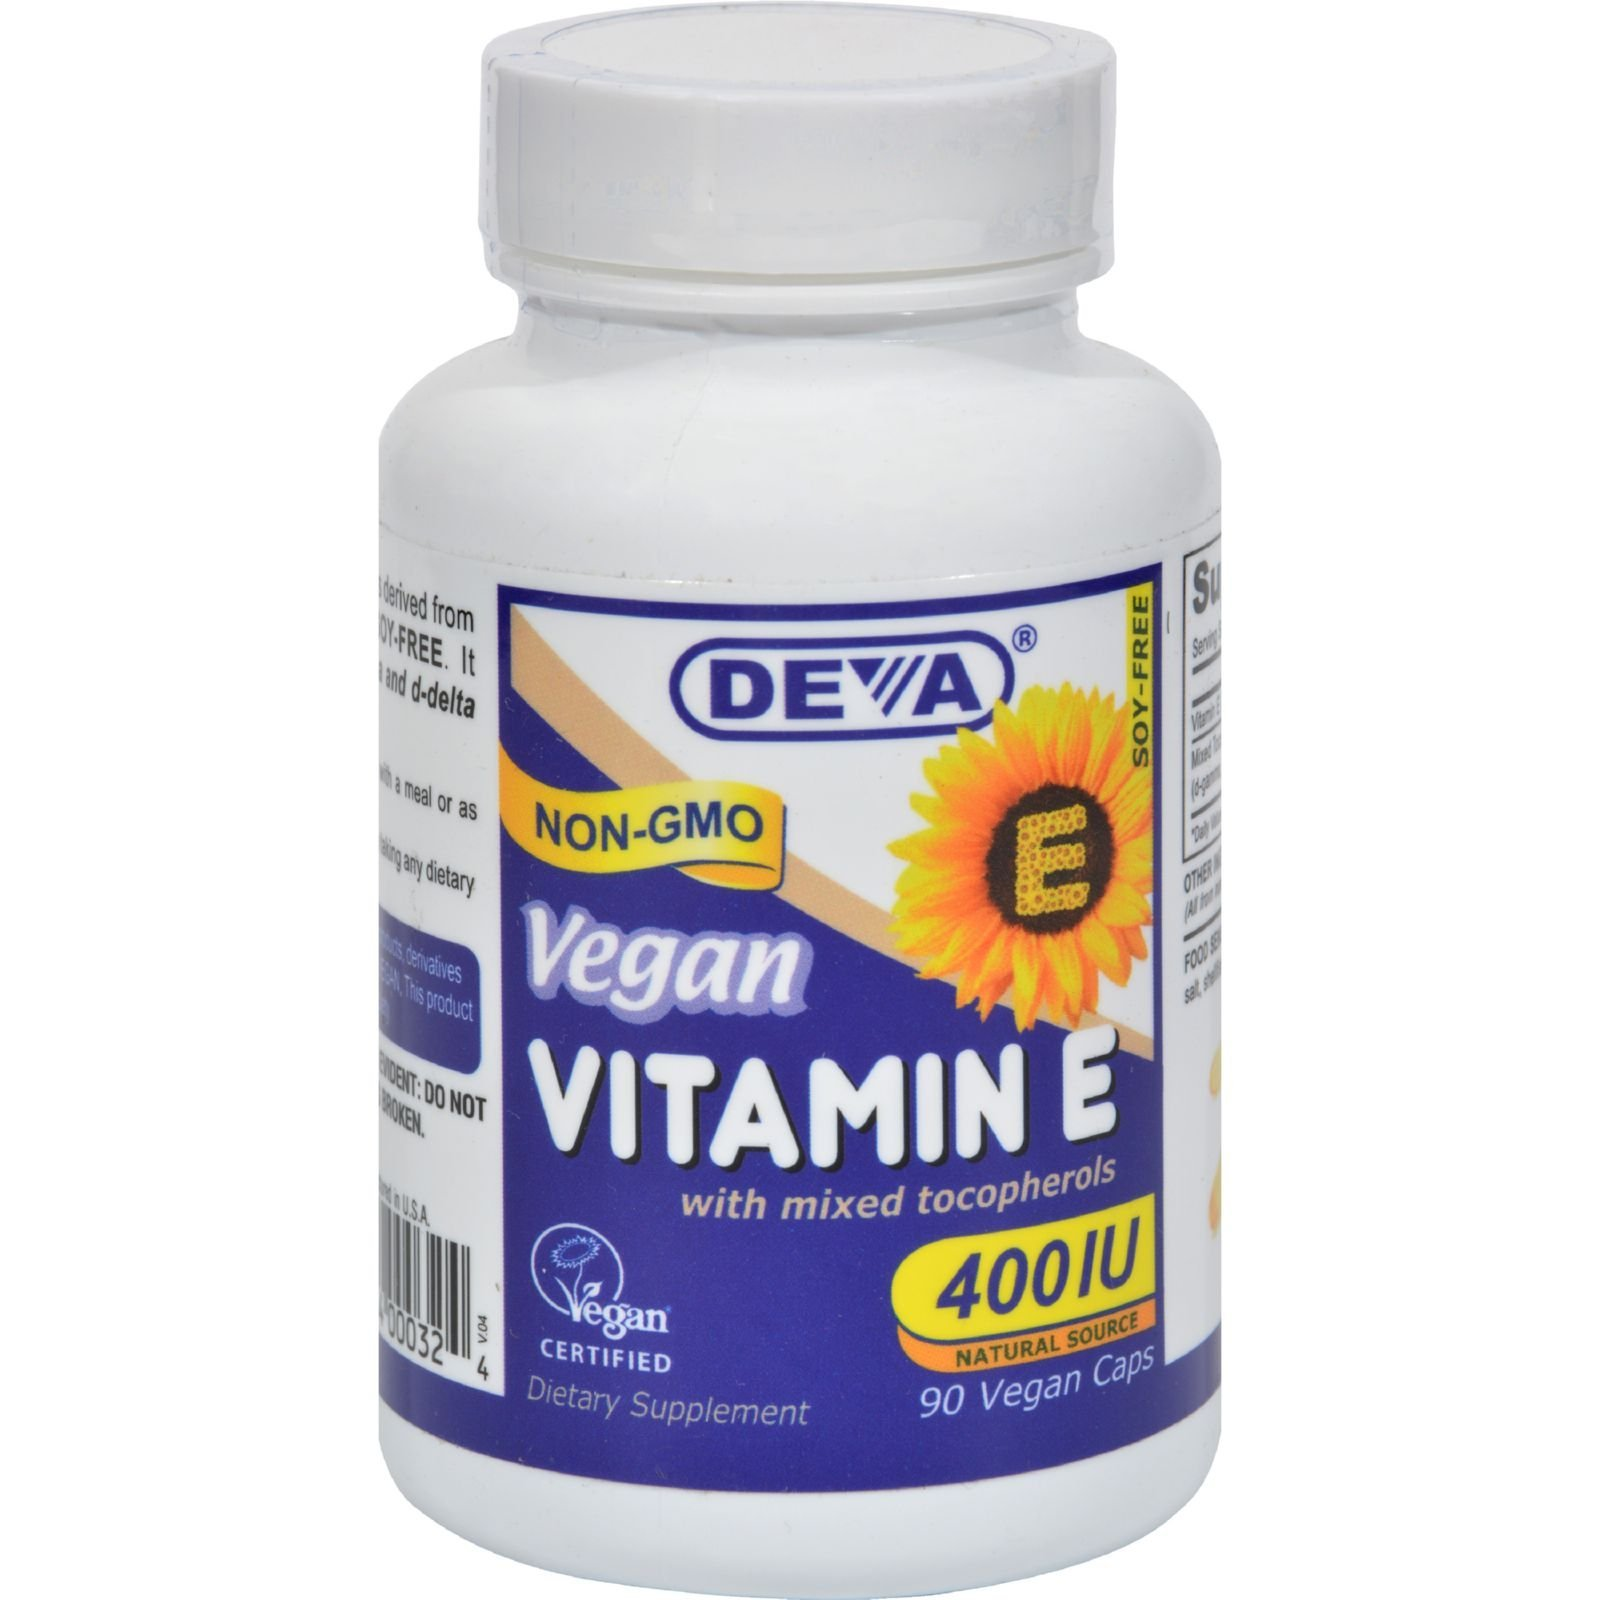 Deva Vegan Vitamins Natural Vitamin E 400iu with Mixed Tocopherols, 90-Count by Deva Vegan Vitamins